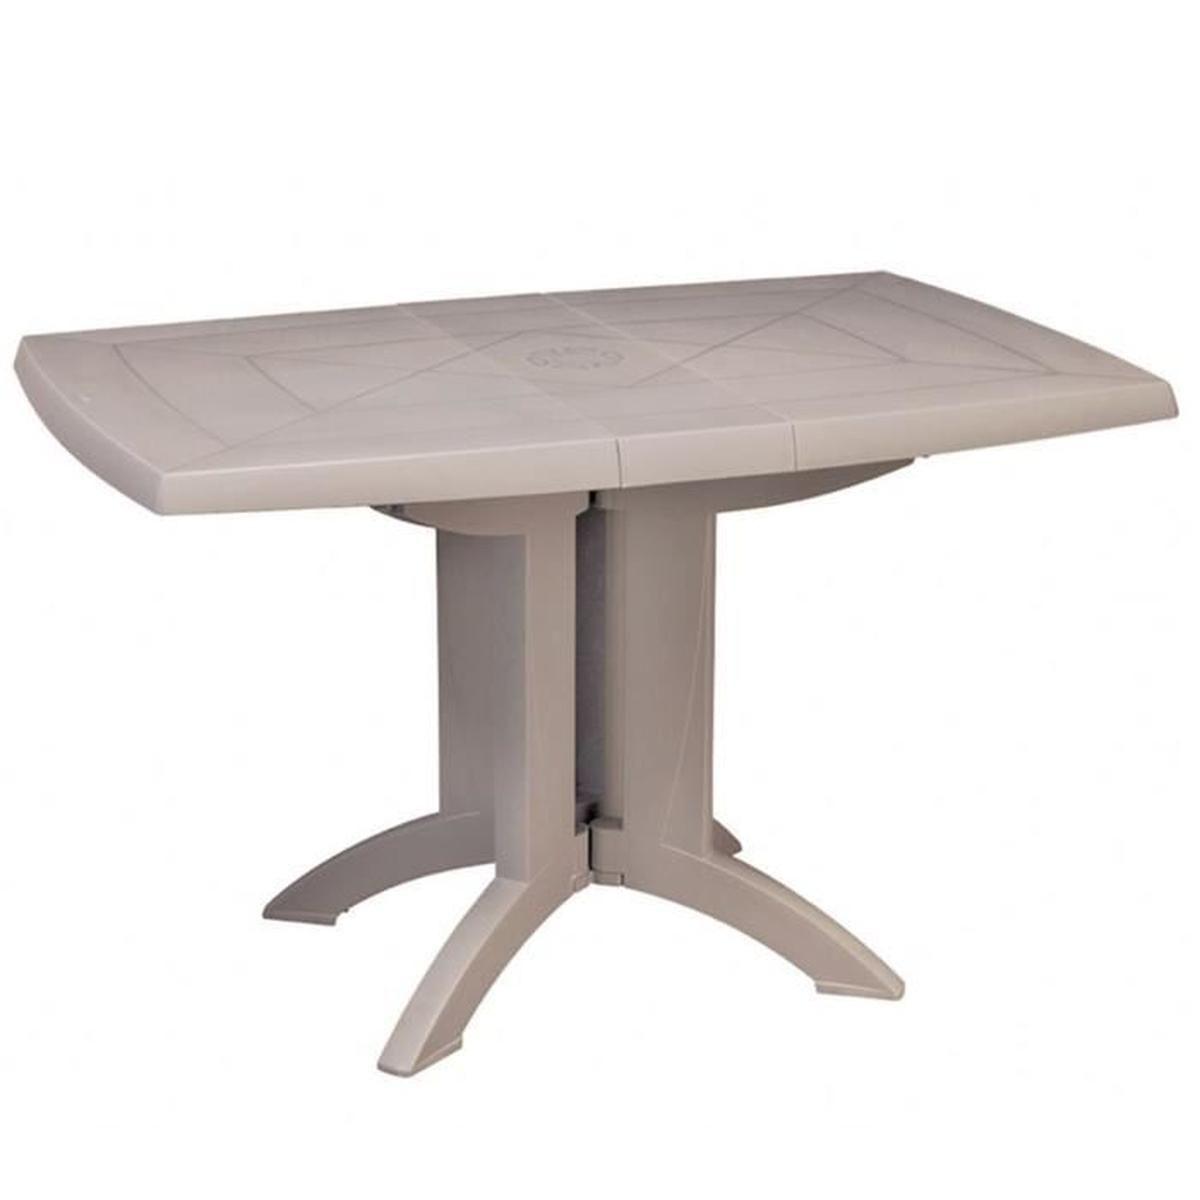 Vega Table De Jardin Grosfillex Pliante Beige En Résine (4 Places) tout Table Jardin Cdiscount